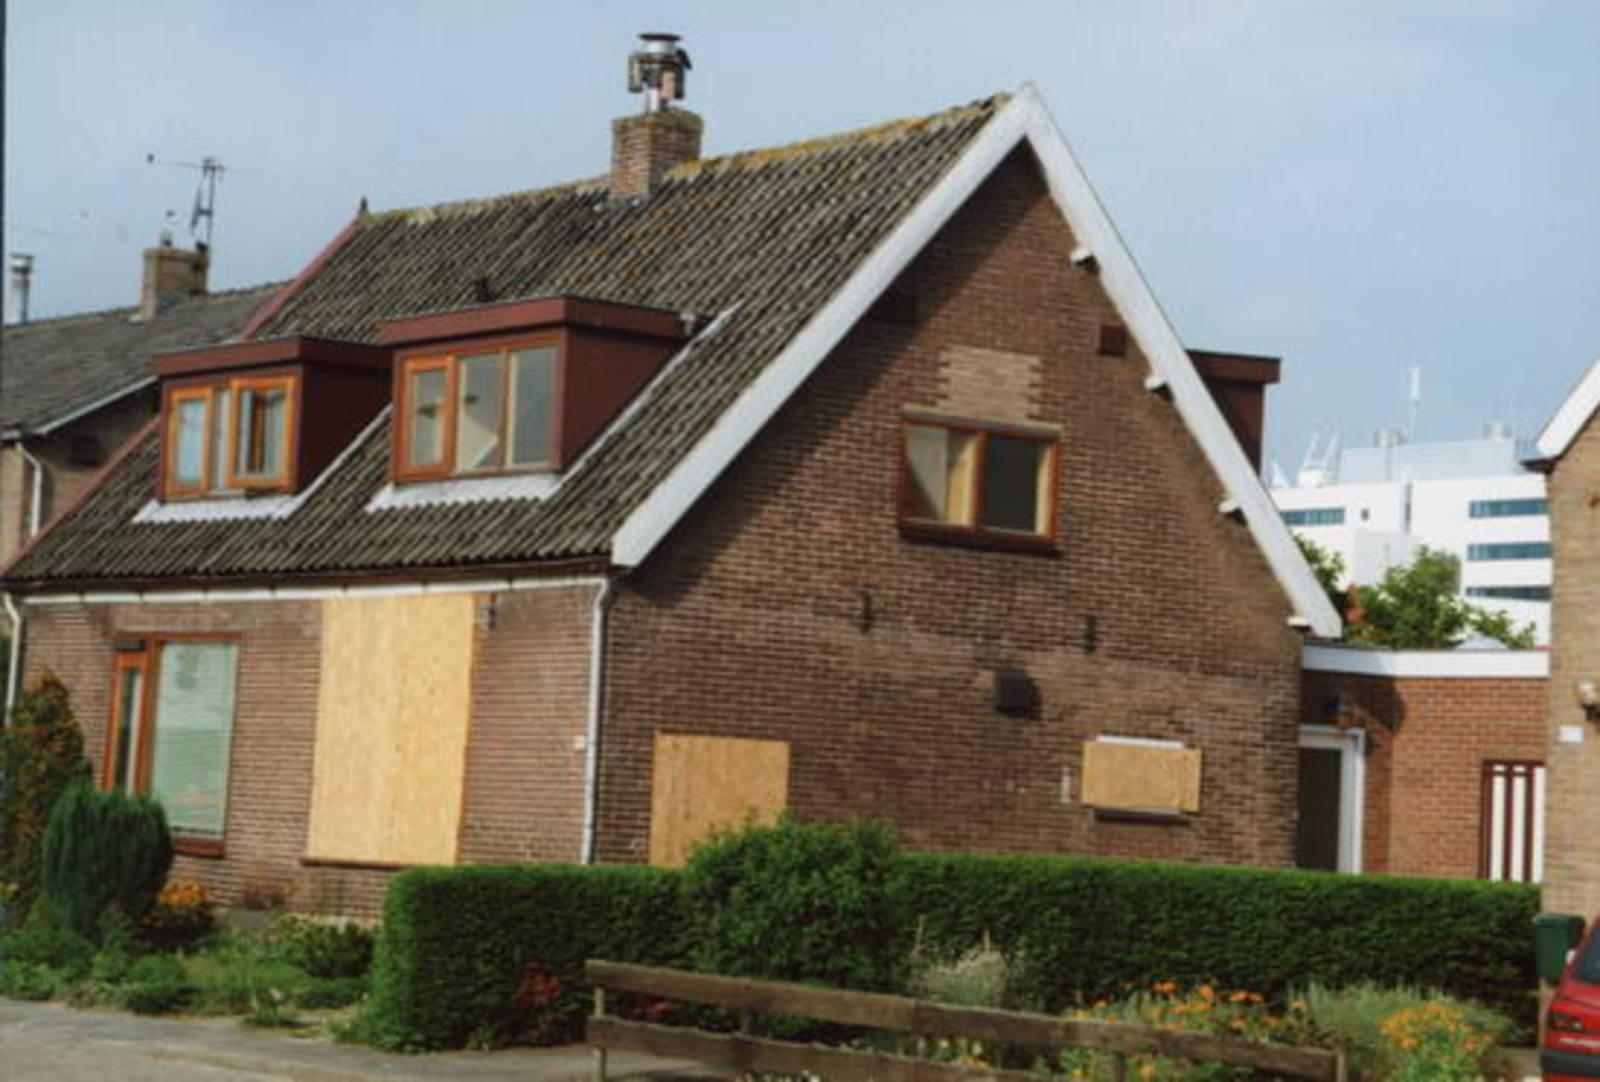 Rijnlanderweg W 0881-883 2001 Huize 51